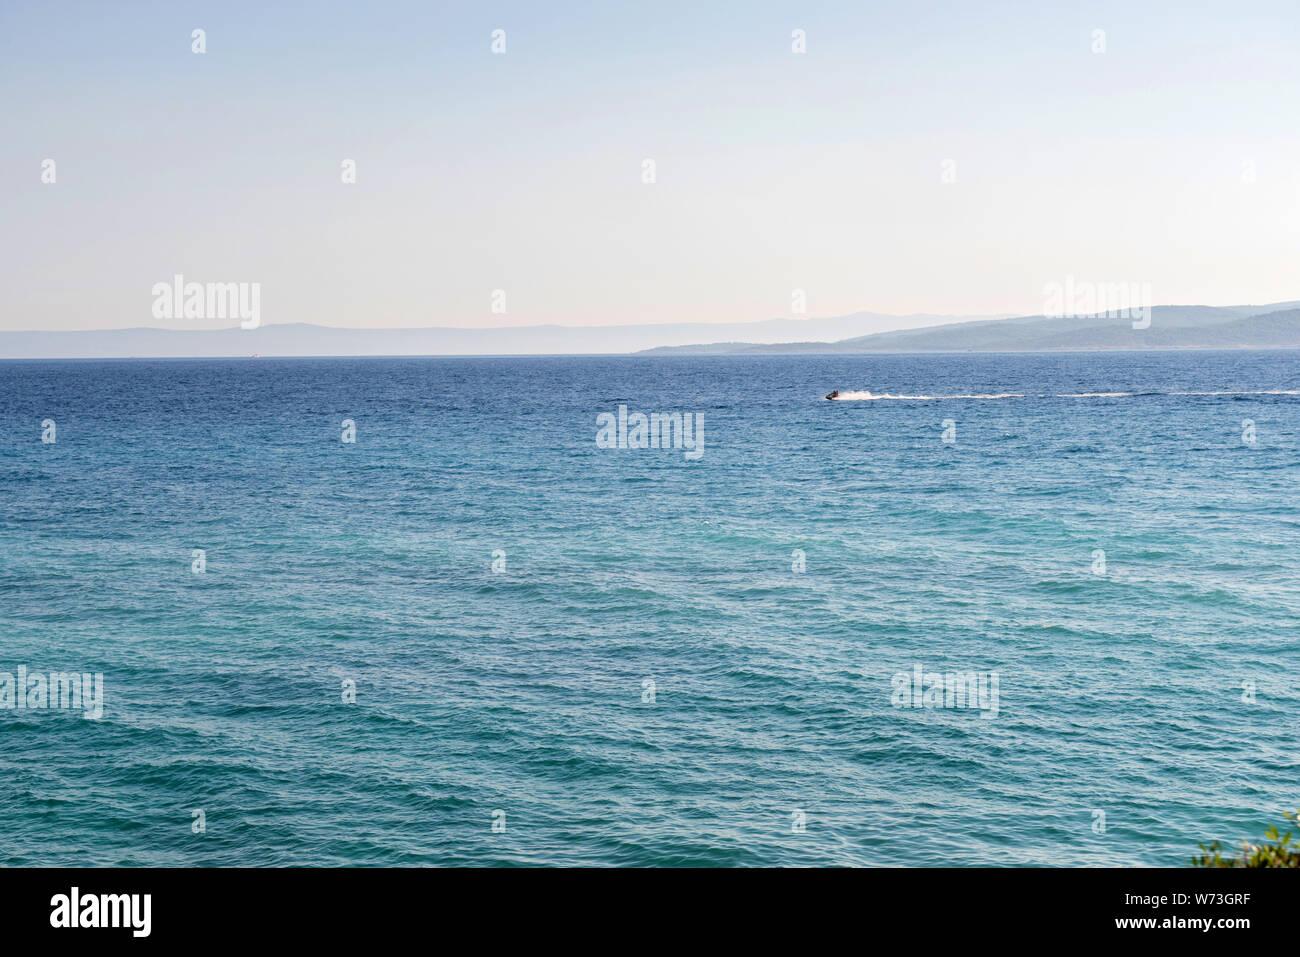 Croatian beach with blue sea and sailboat on horizon in Istria, Croatian coast Stock Photo